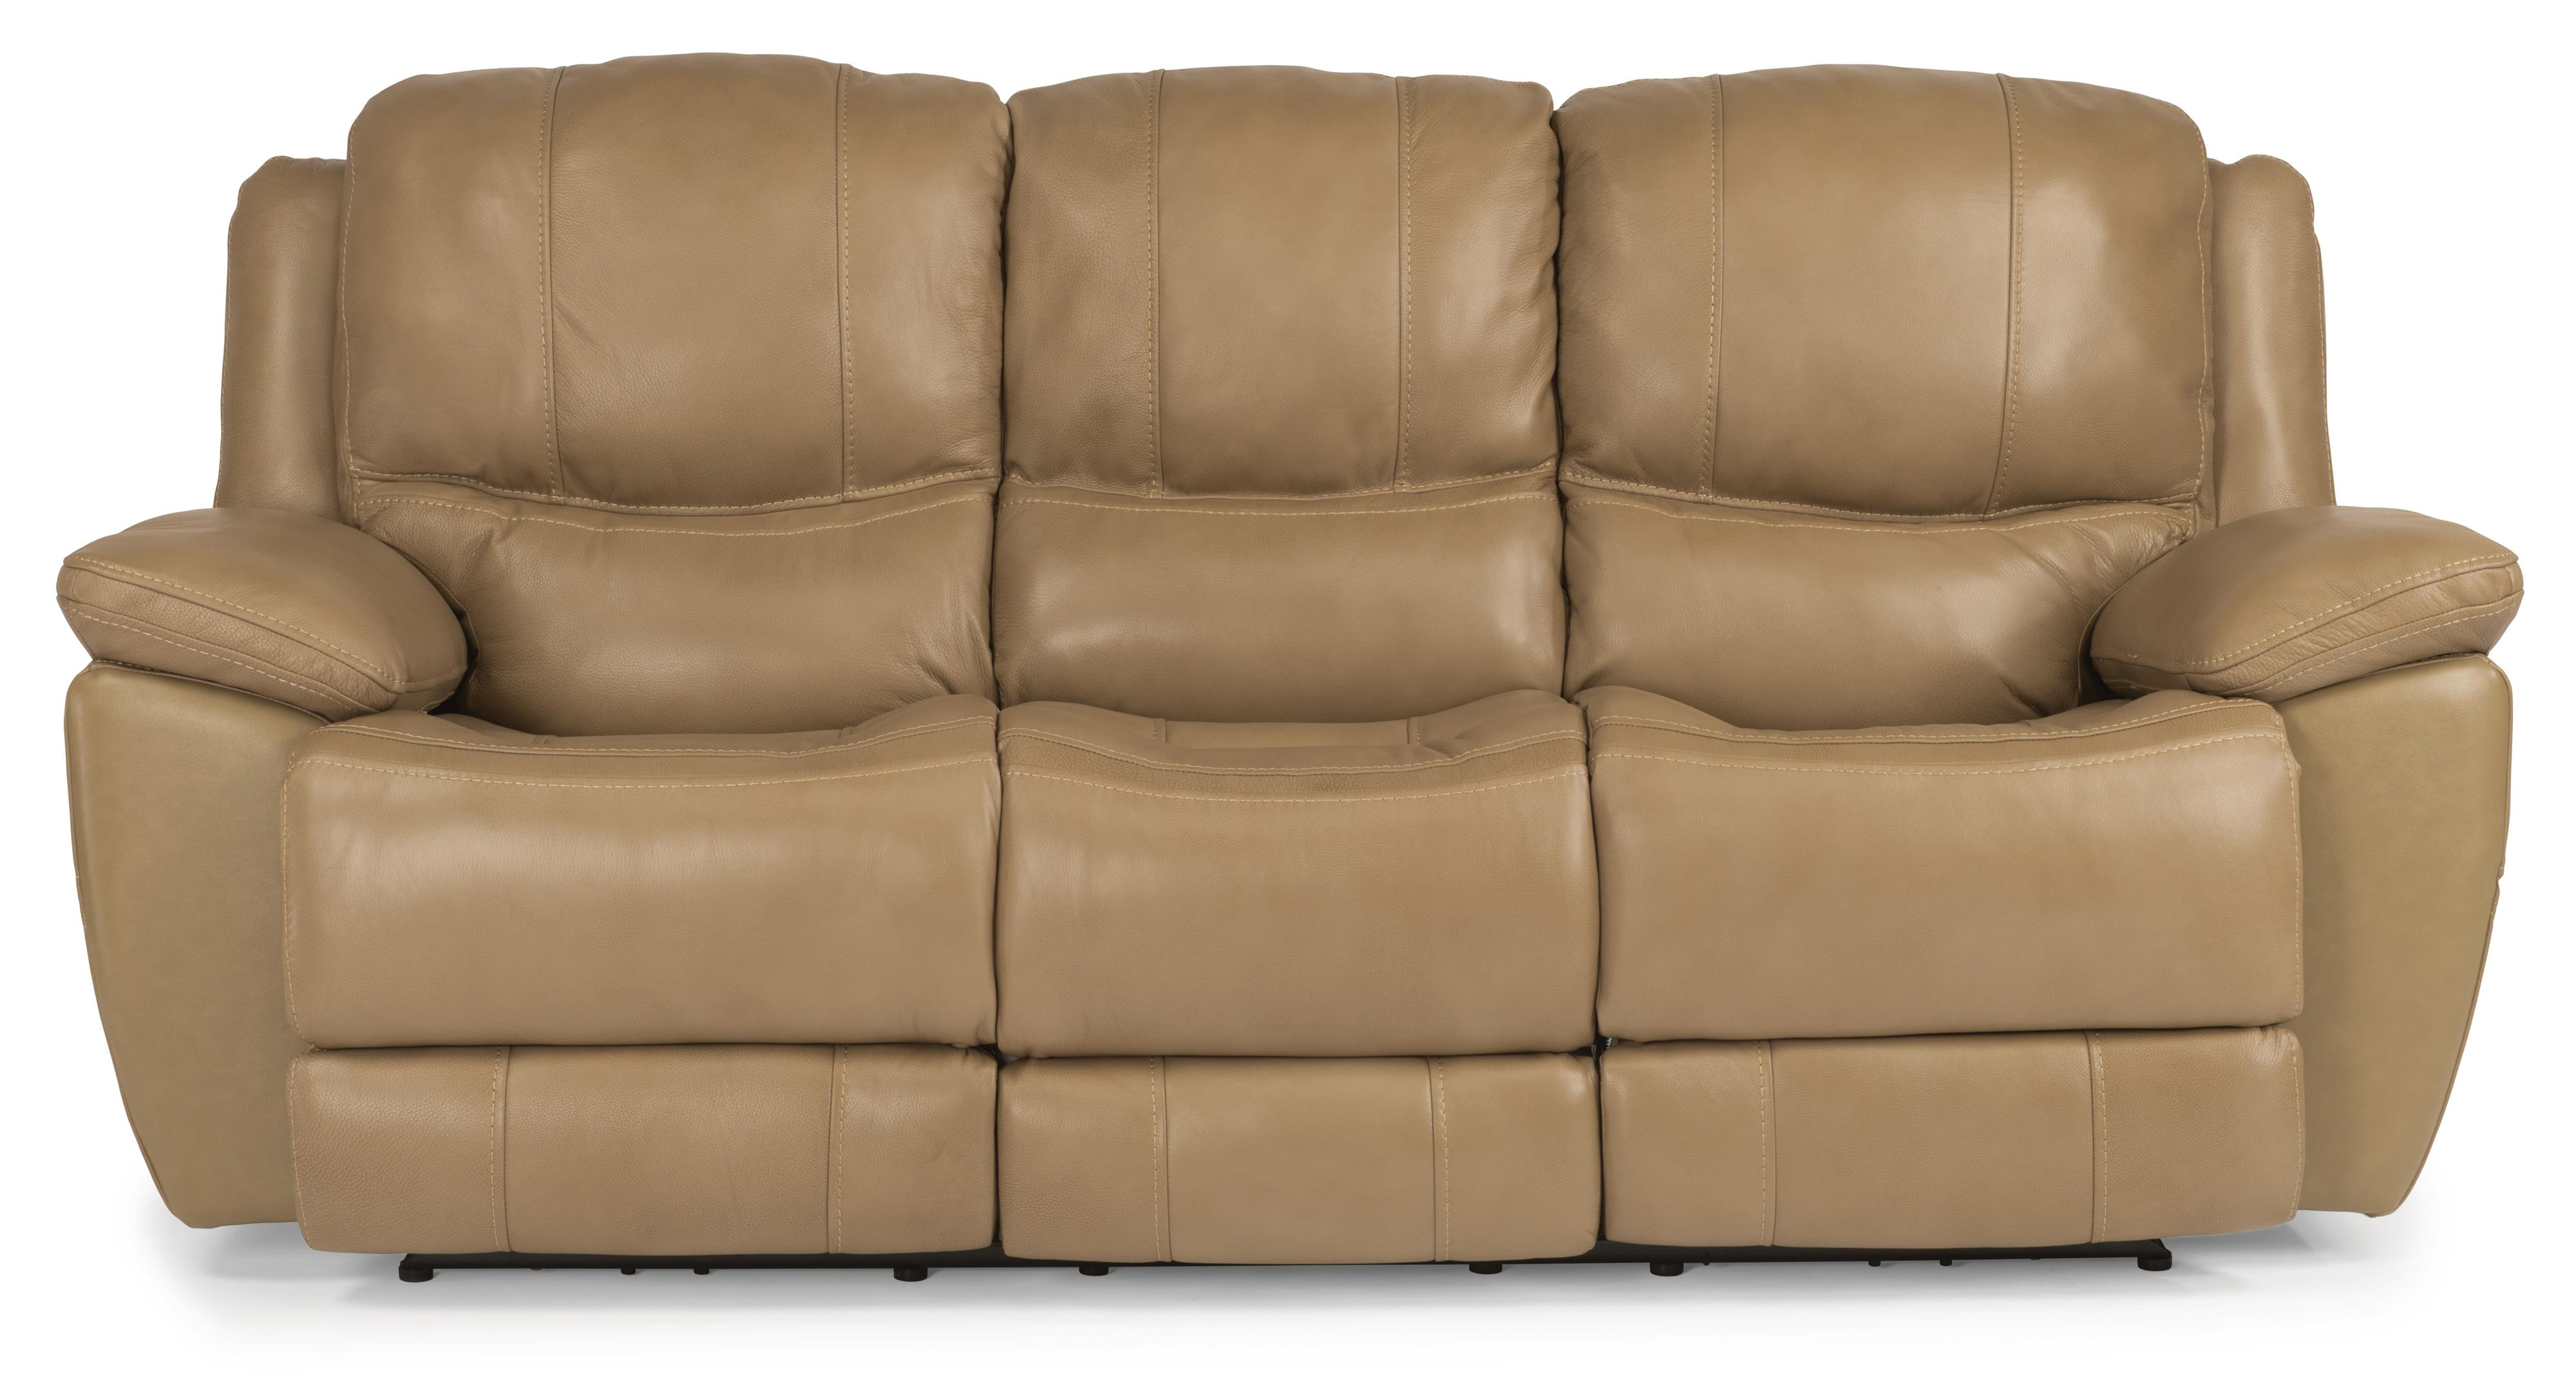 Flexsteel Latitudes Estella Casual Power Reclining Sofa with